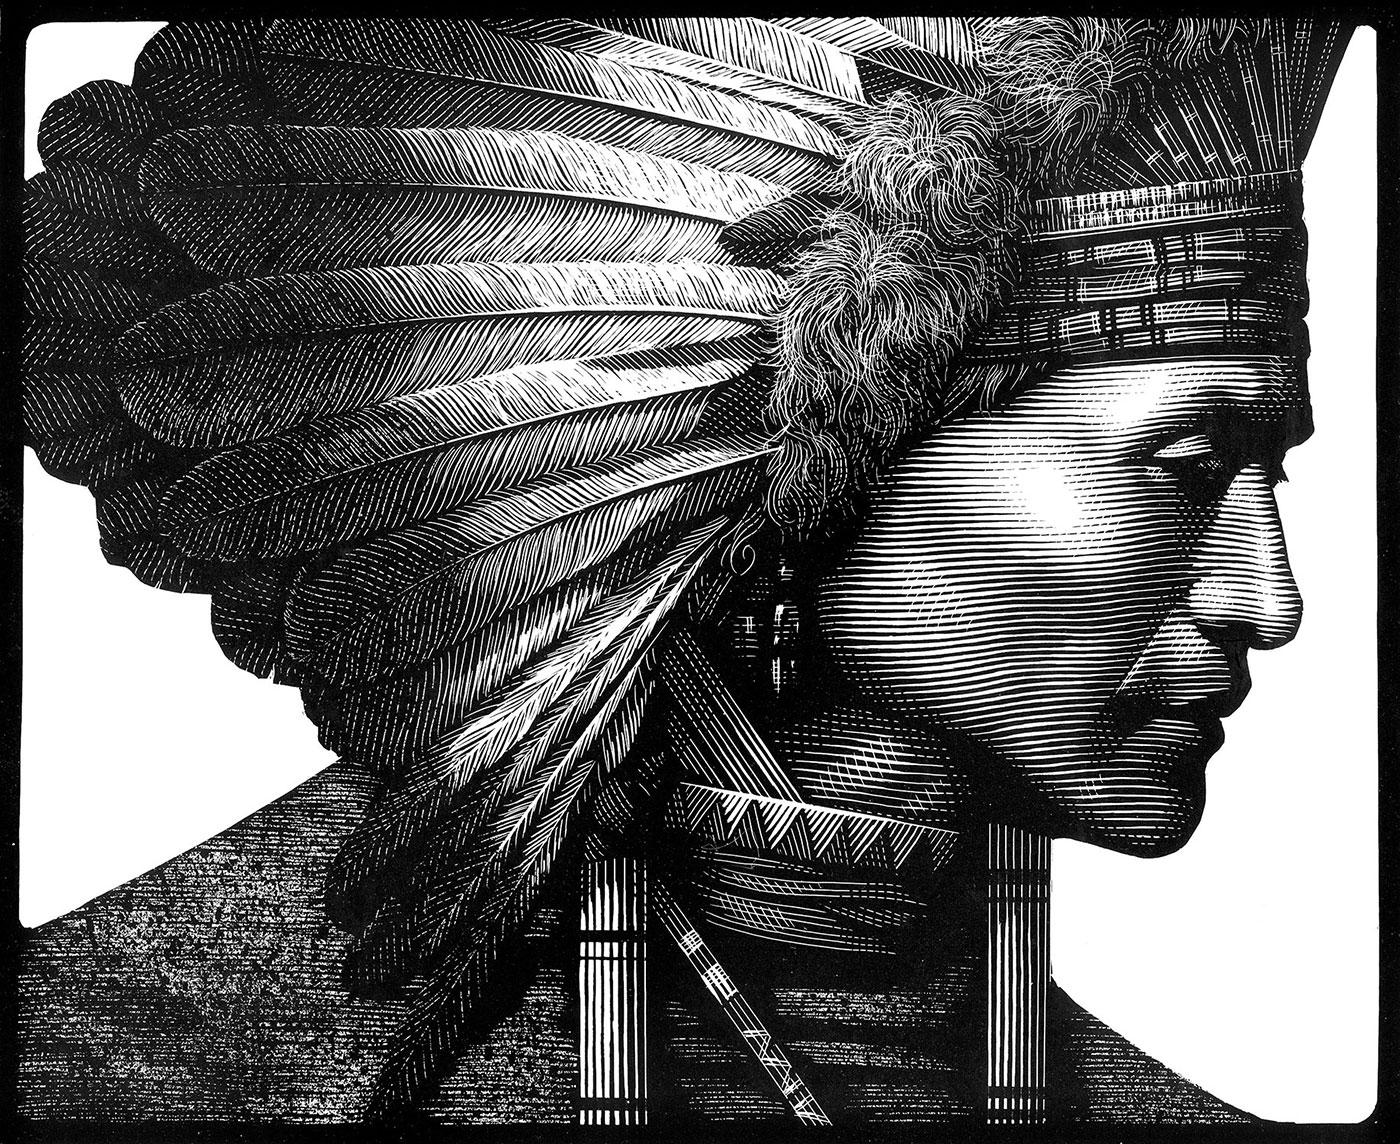 Richard Solomon - Mark-Summers-421-indian